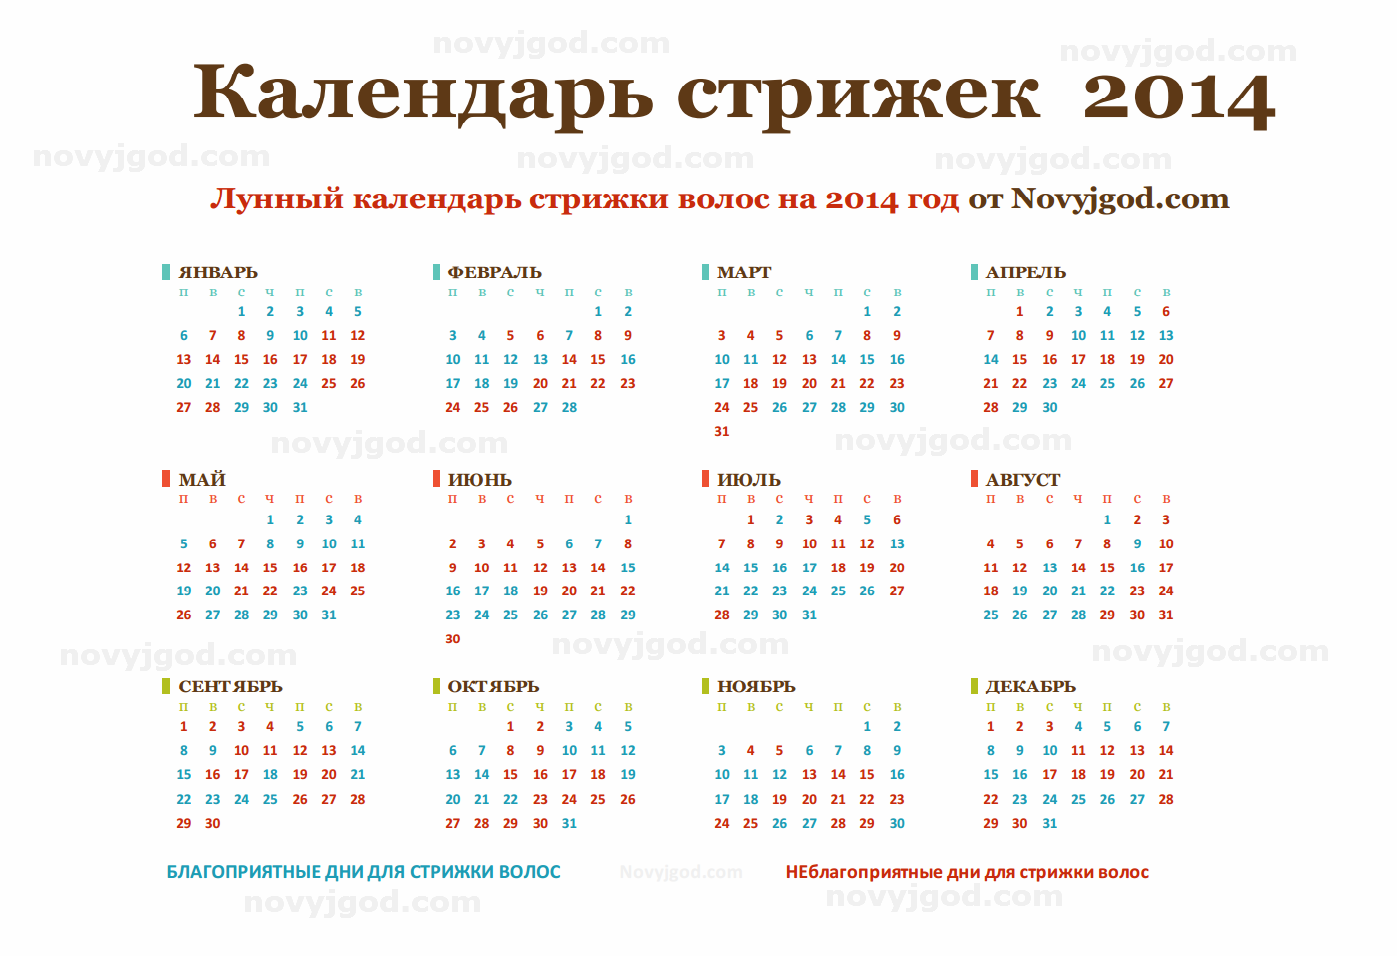 Стрижка для женщин по лунному календарю